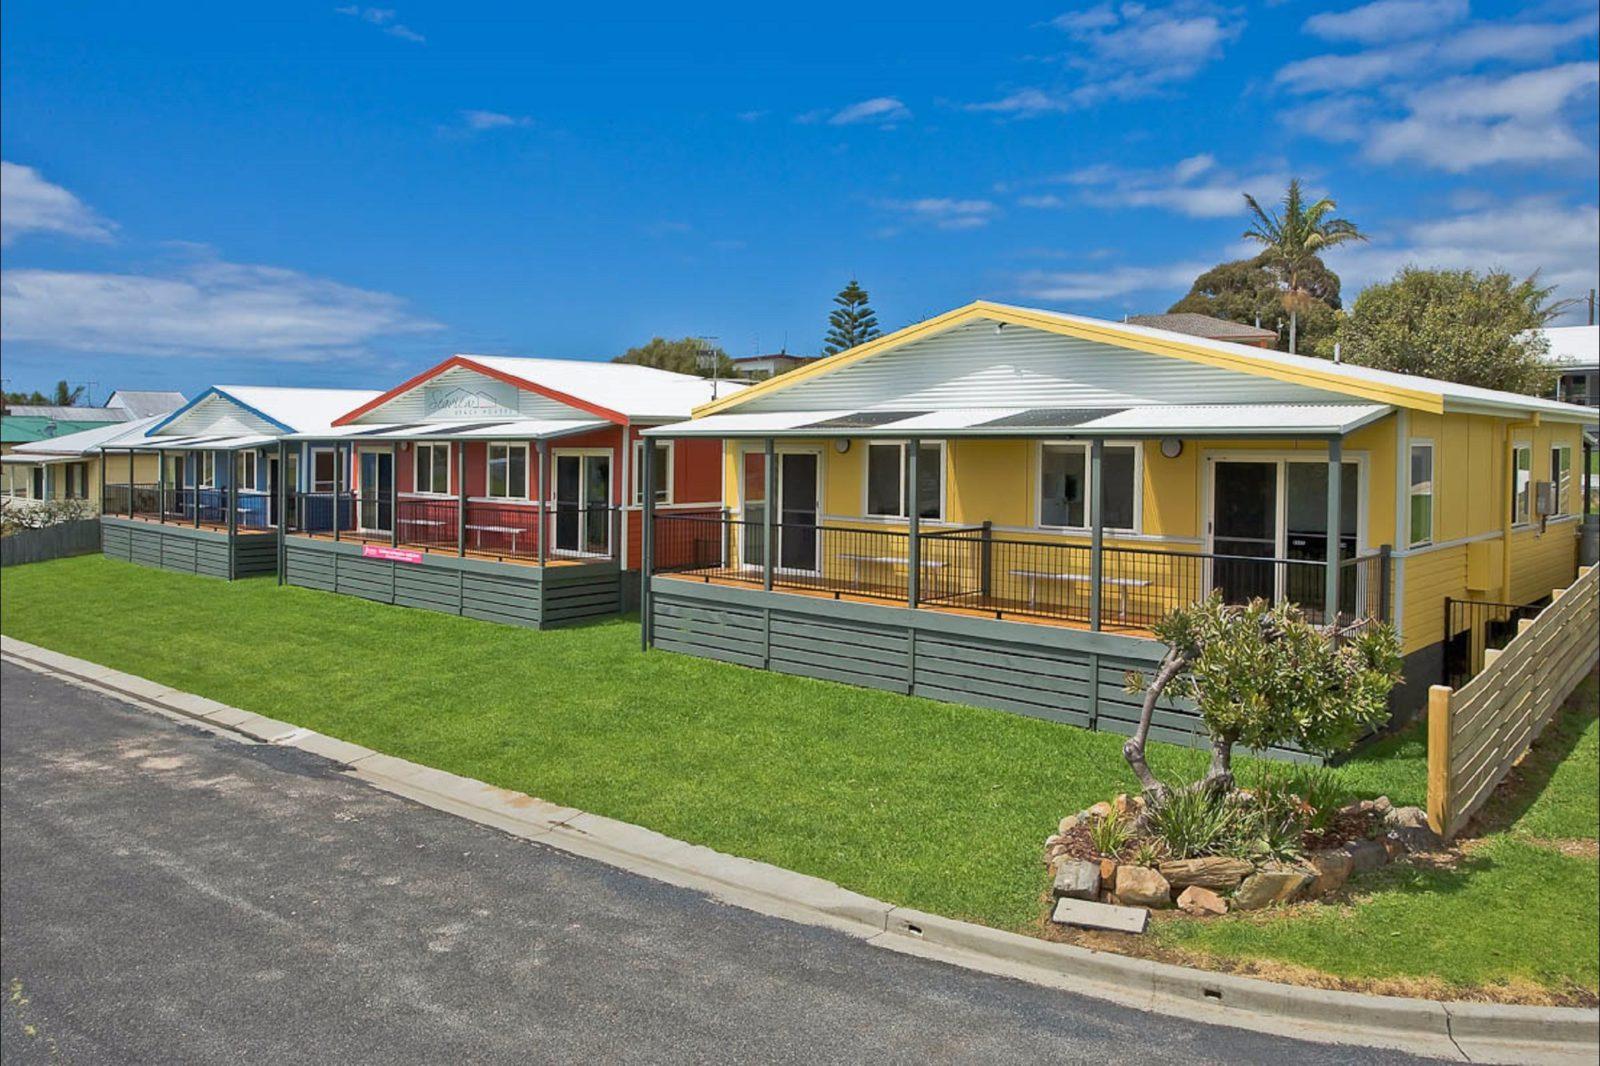 Seaview Beach Houses - 2 bedroom beach houses